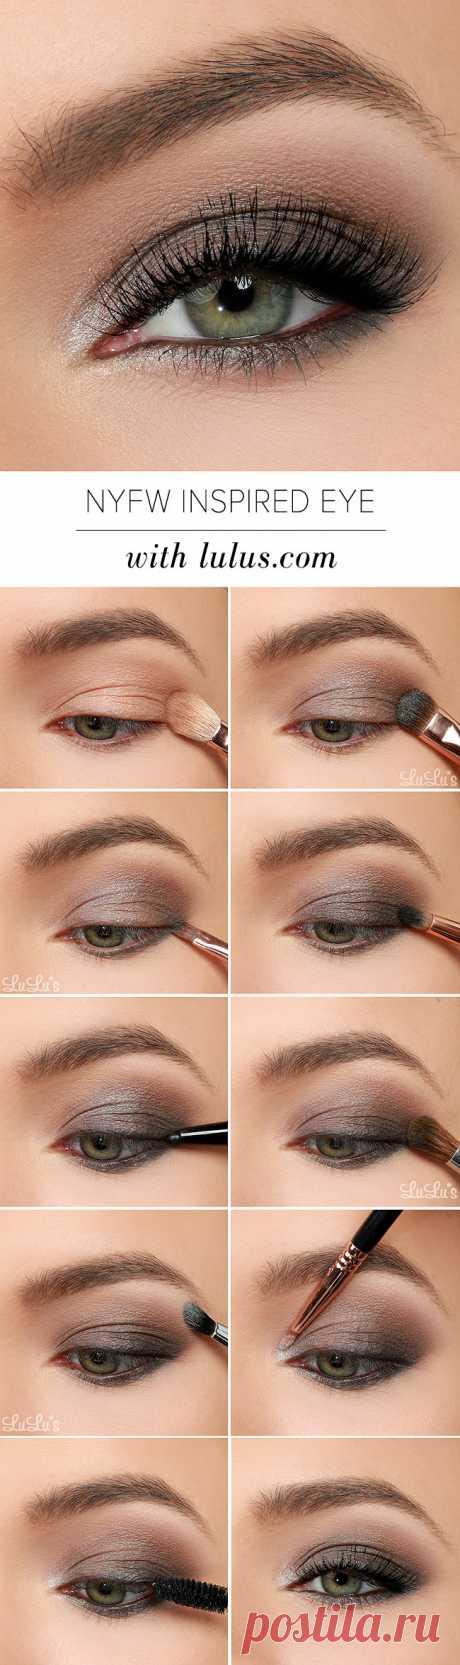 Lulus How-To: 2015 NYFW Inspired Eye Shadow Tutorial - Lulus.com Fashion Blog